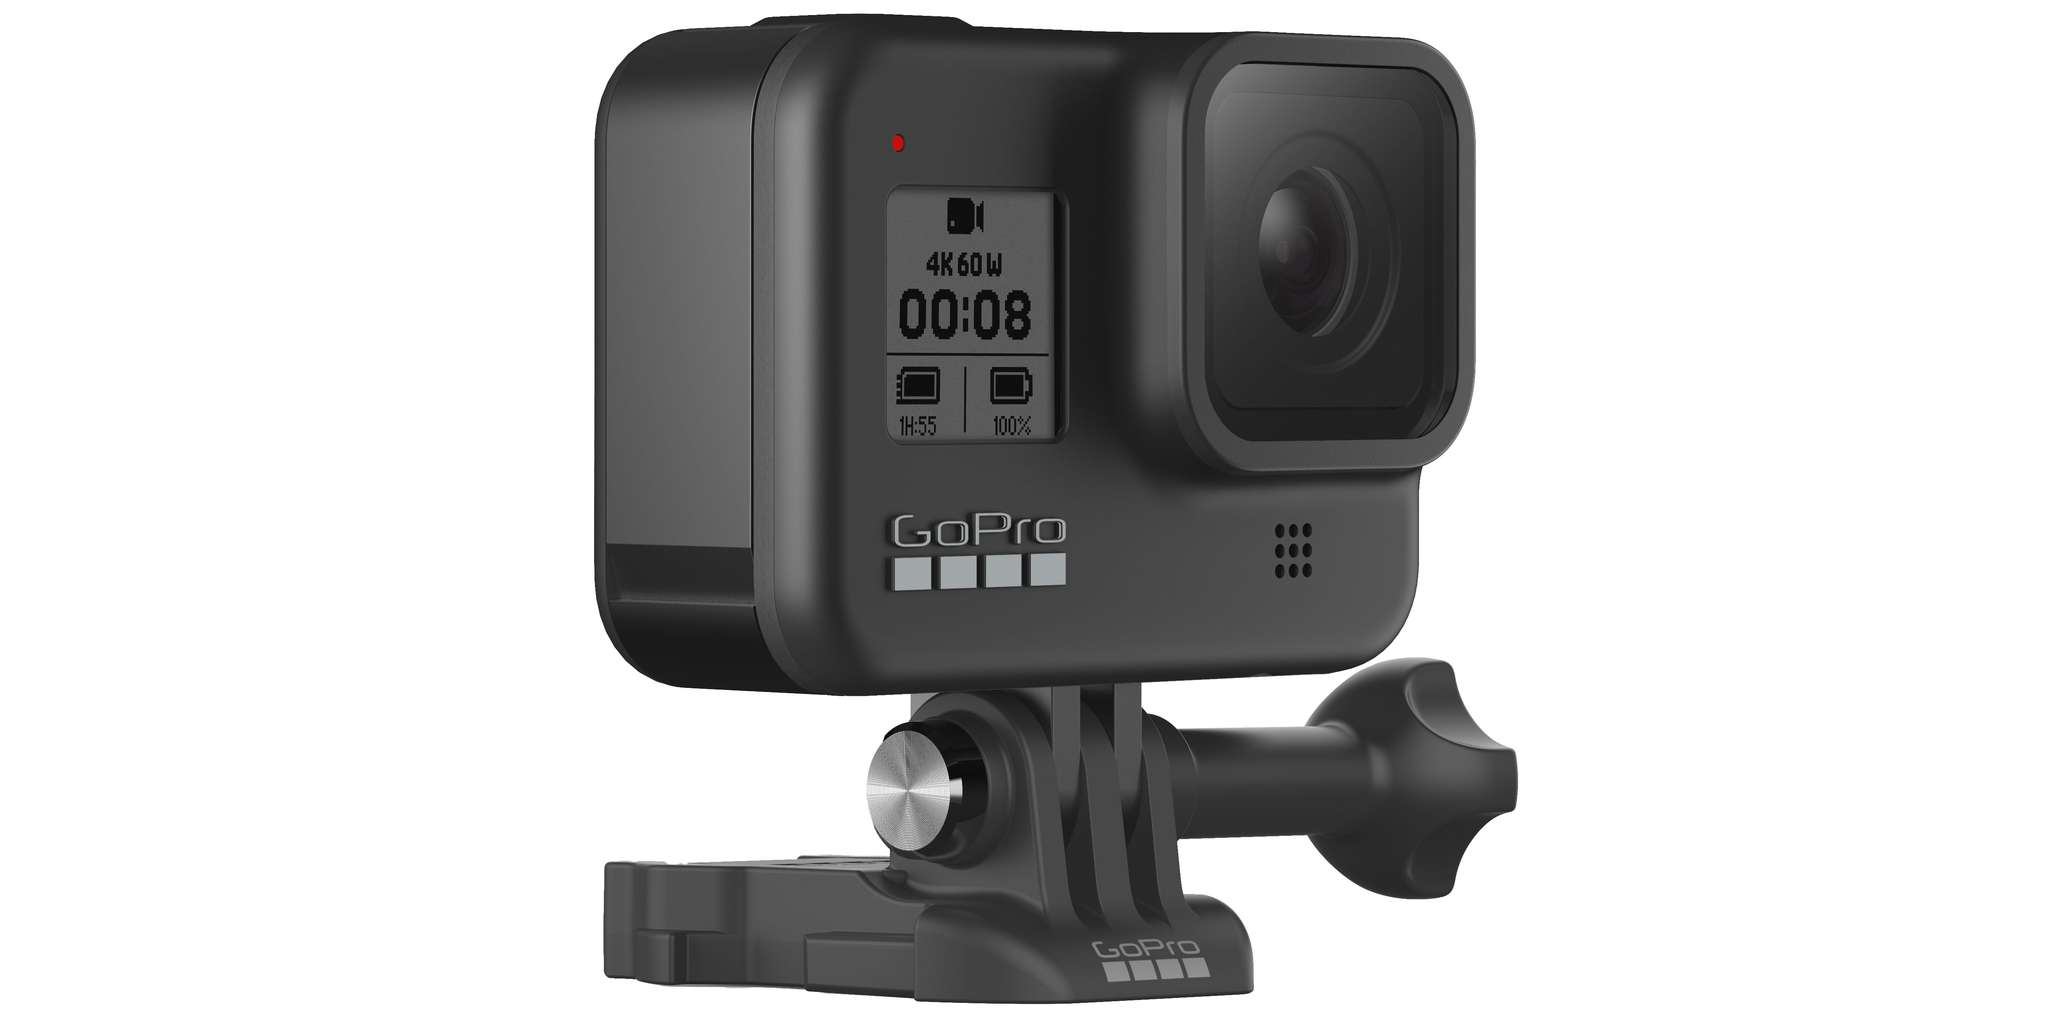 Экшн-камера GoPro HERO8 на платформе сбоку